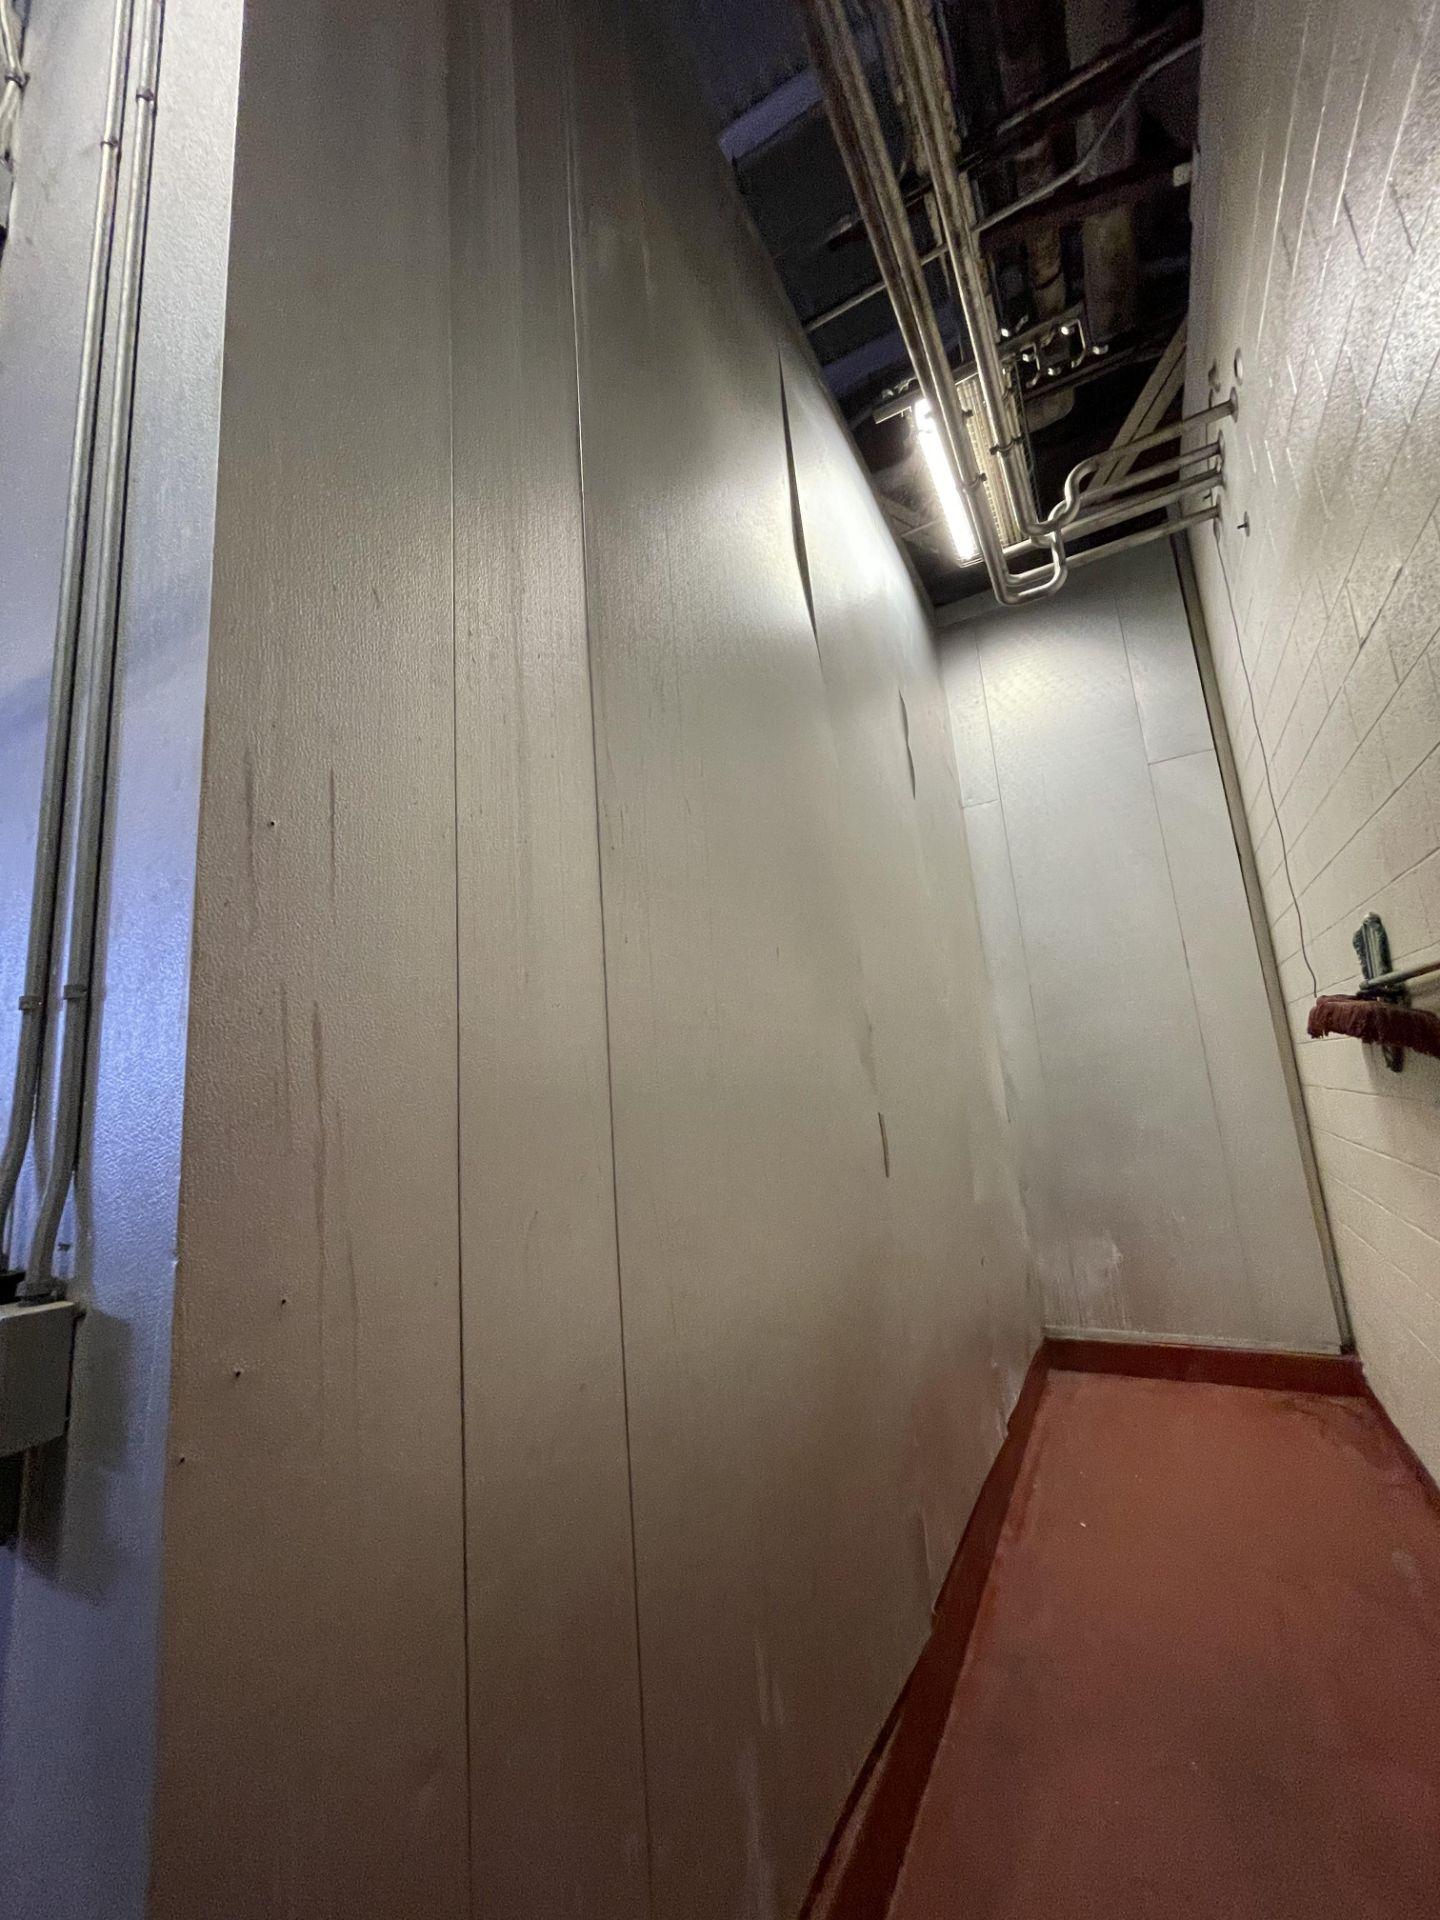 37x26 Cold Storage Room - Image 2 of 7